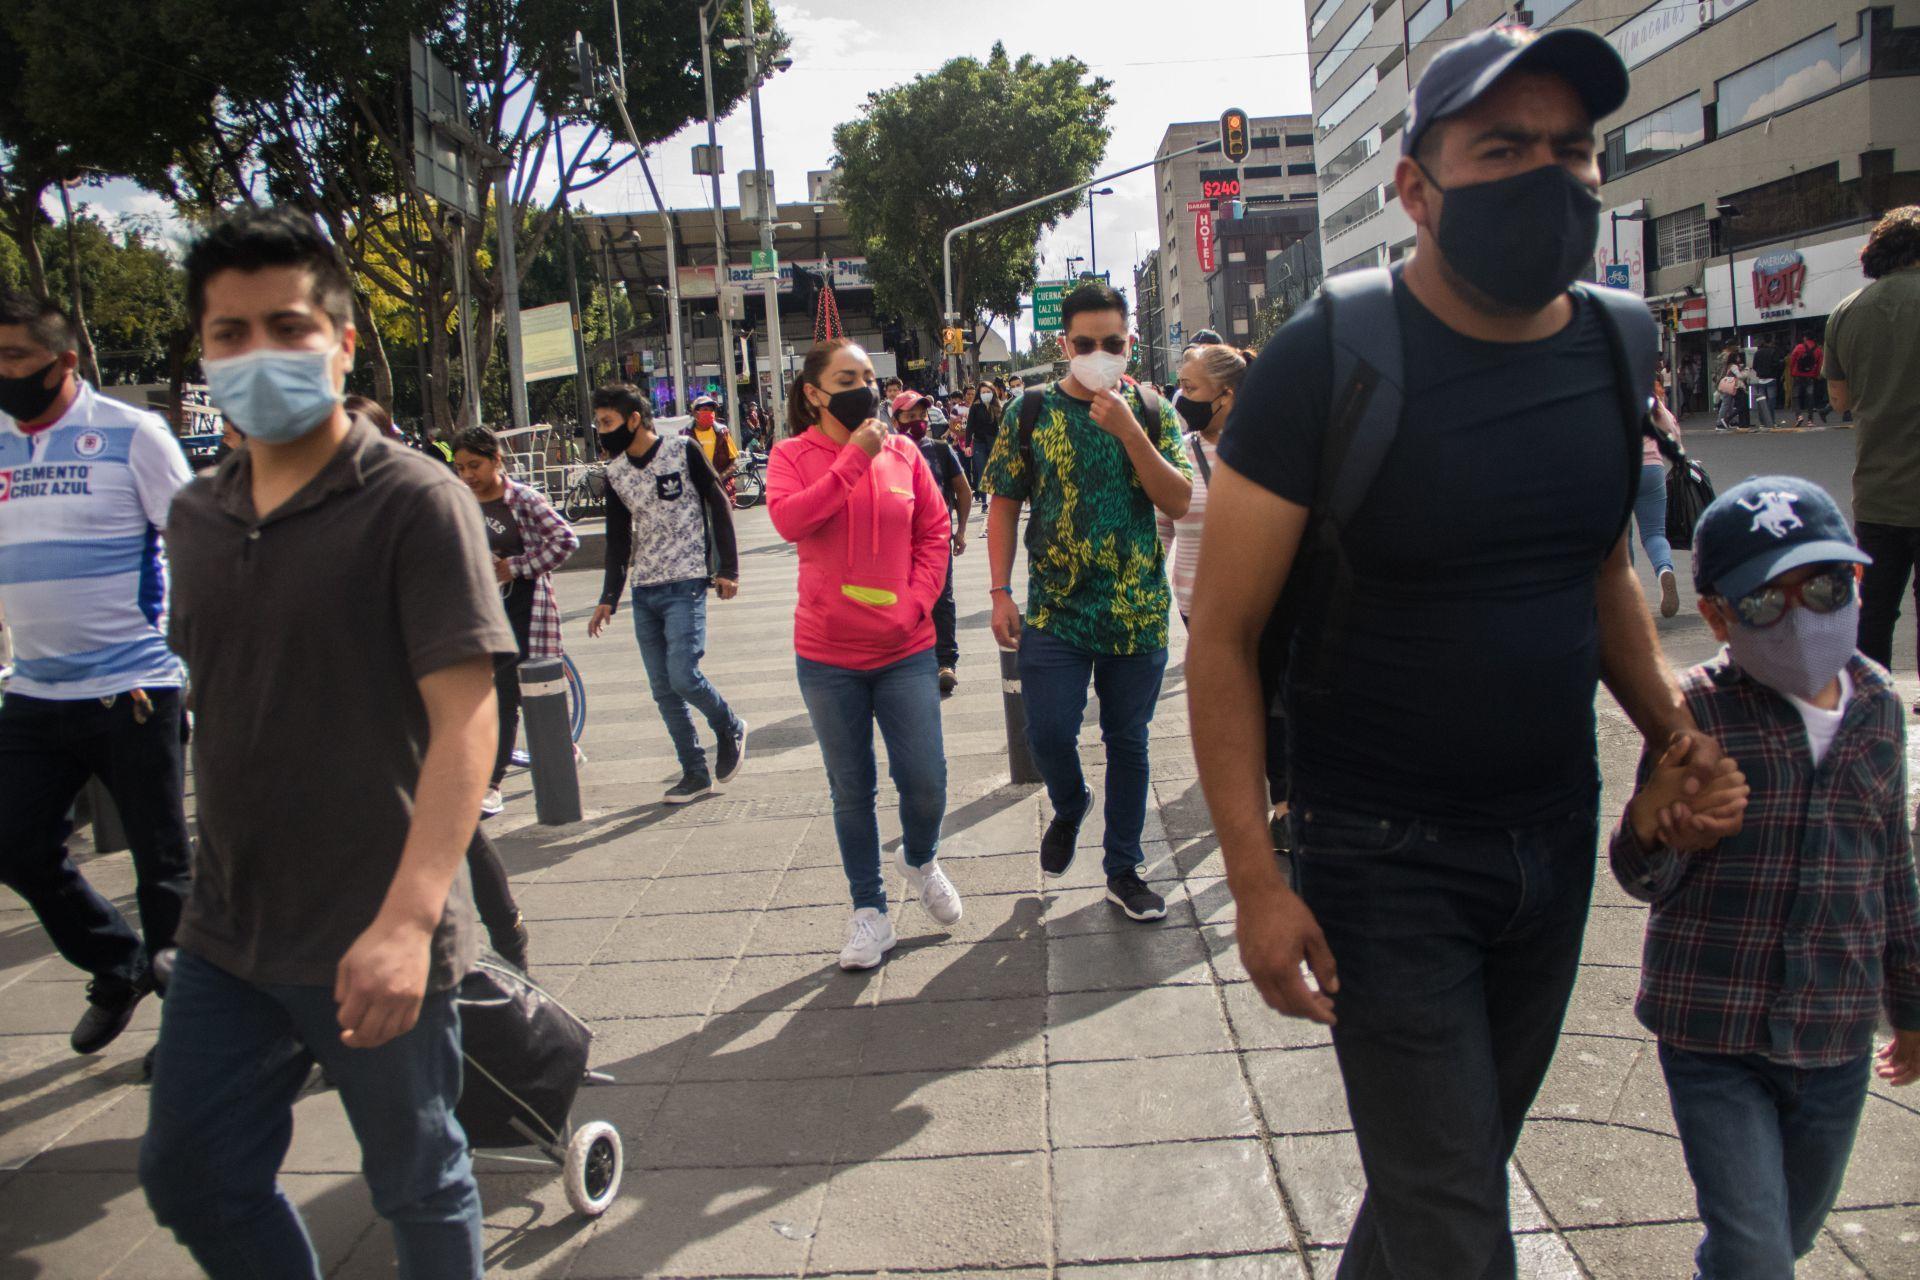 Centro Histórico. Ciudad de México, 6 de diciembre de 2020.